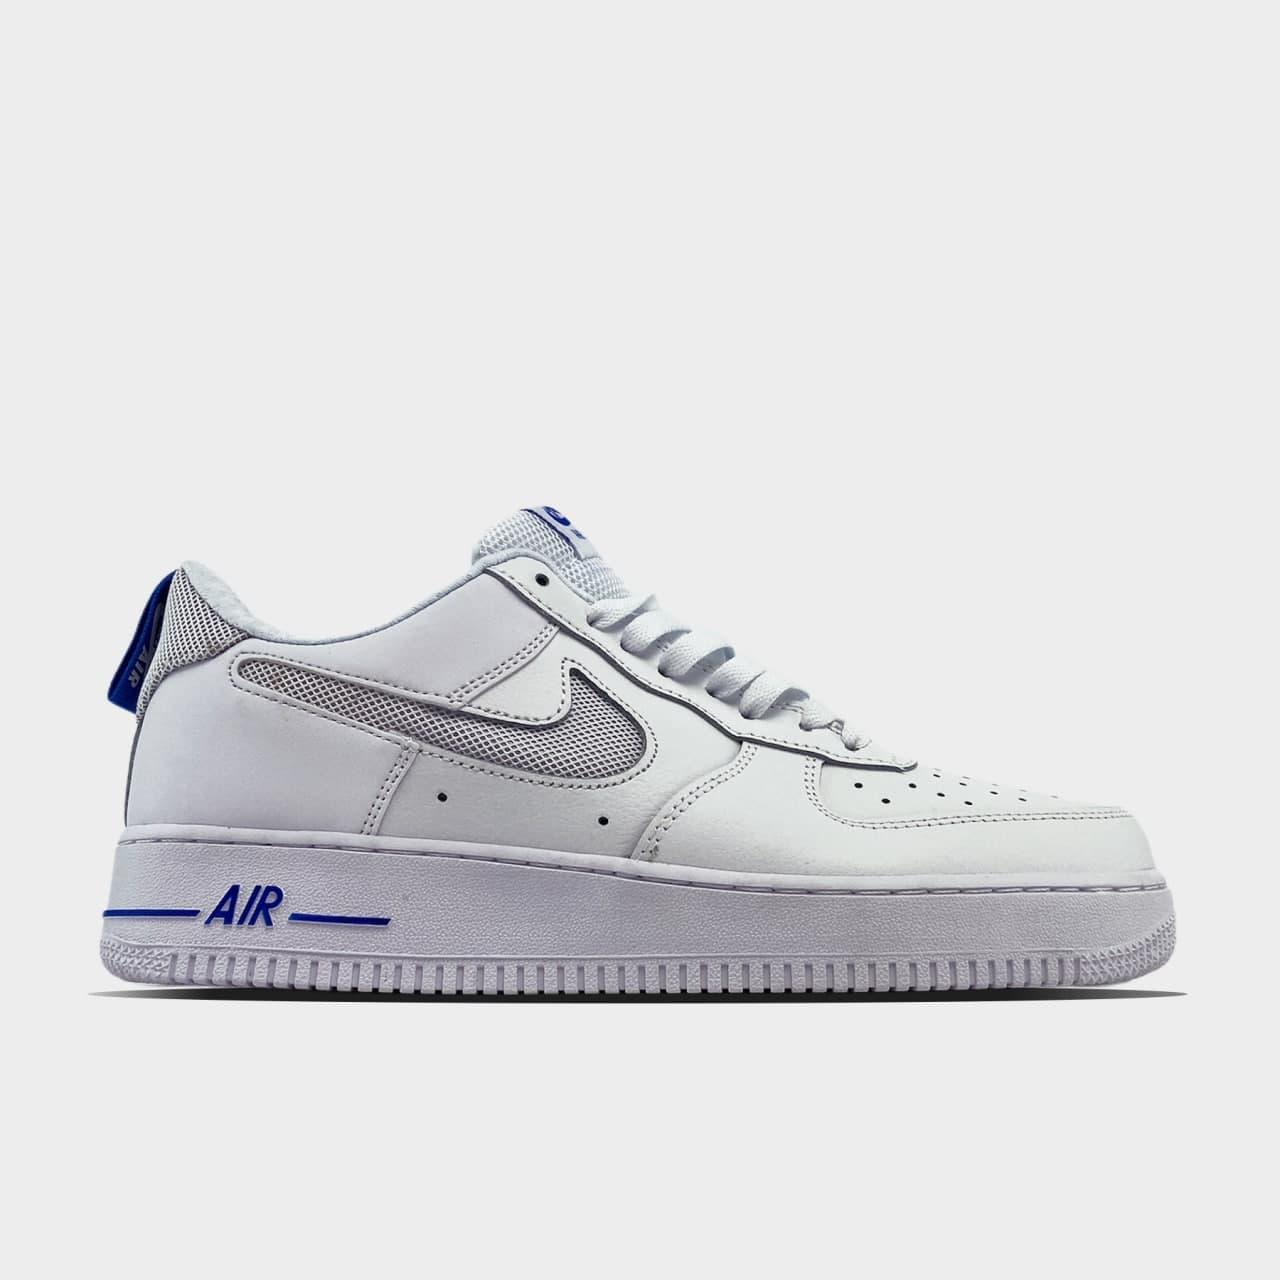 Кроссовки Nike Air Force 1 07 LV8 GS White Blue мужские, белого цвета, Найк Аир Форс 42